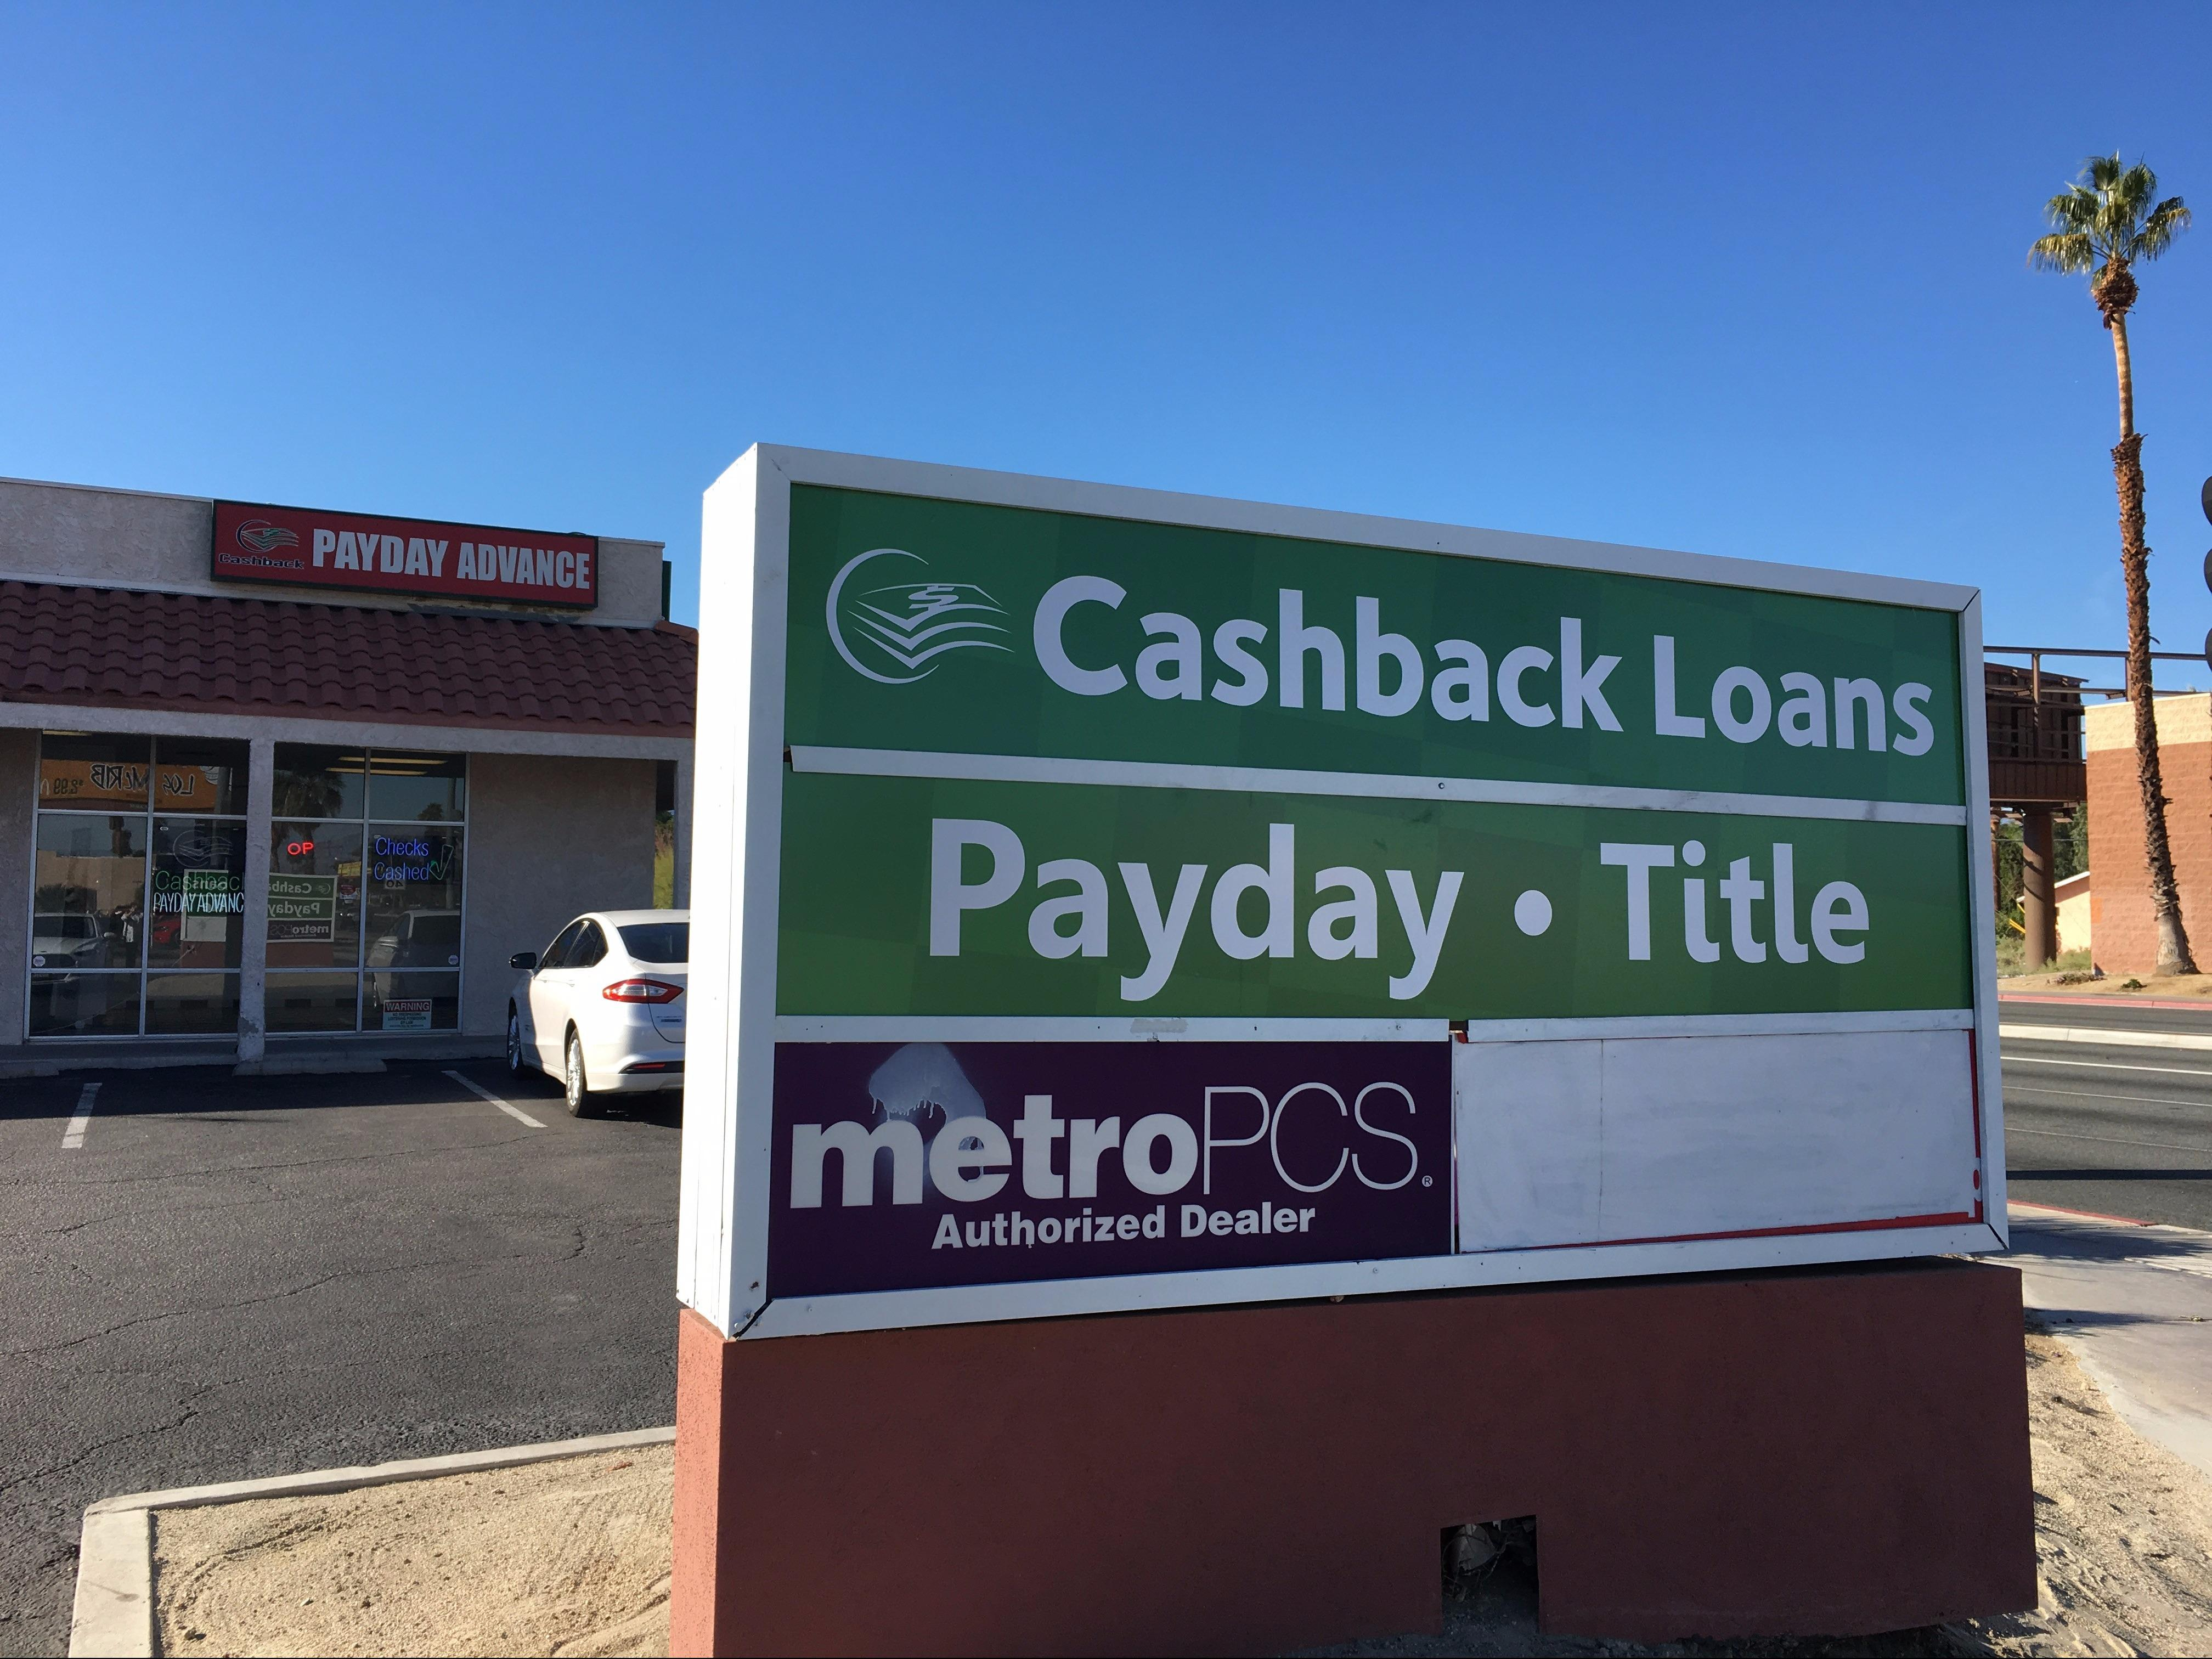 Cashback Loans image 5